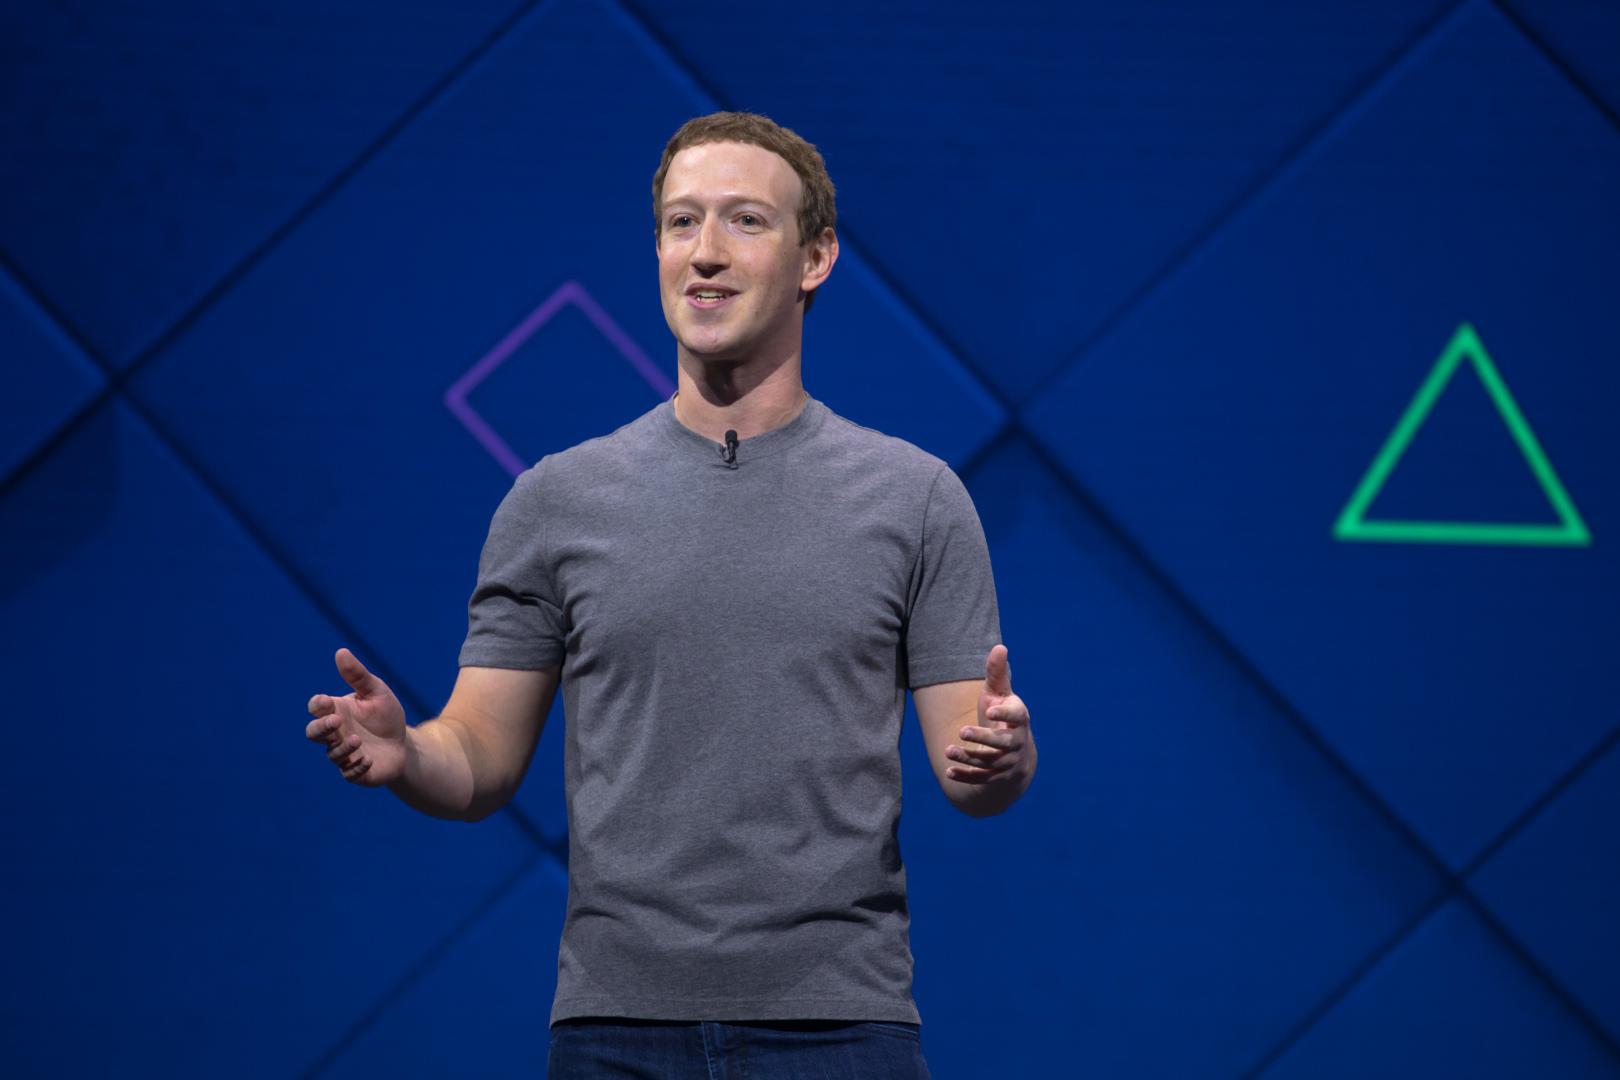 Mark Zuckerberg presenting to an audience.